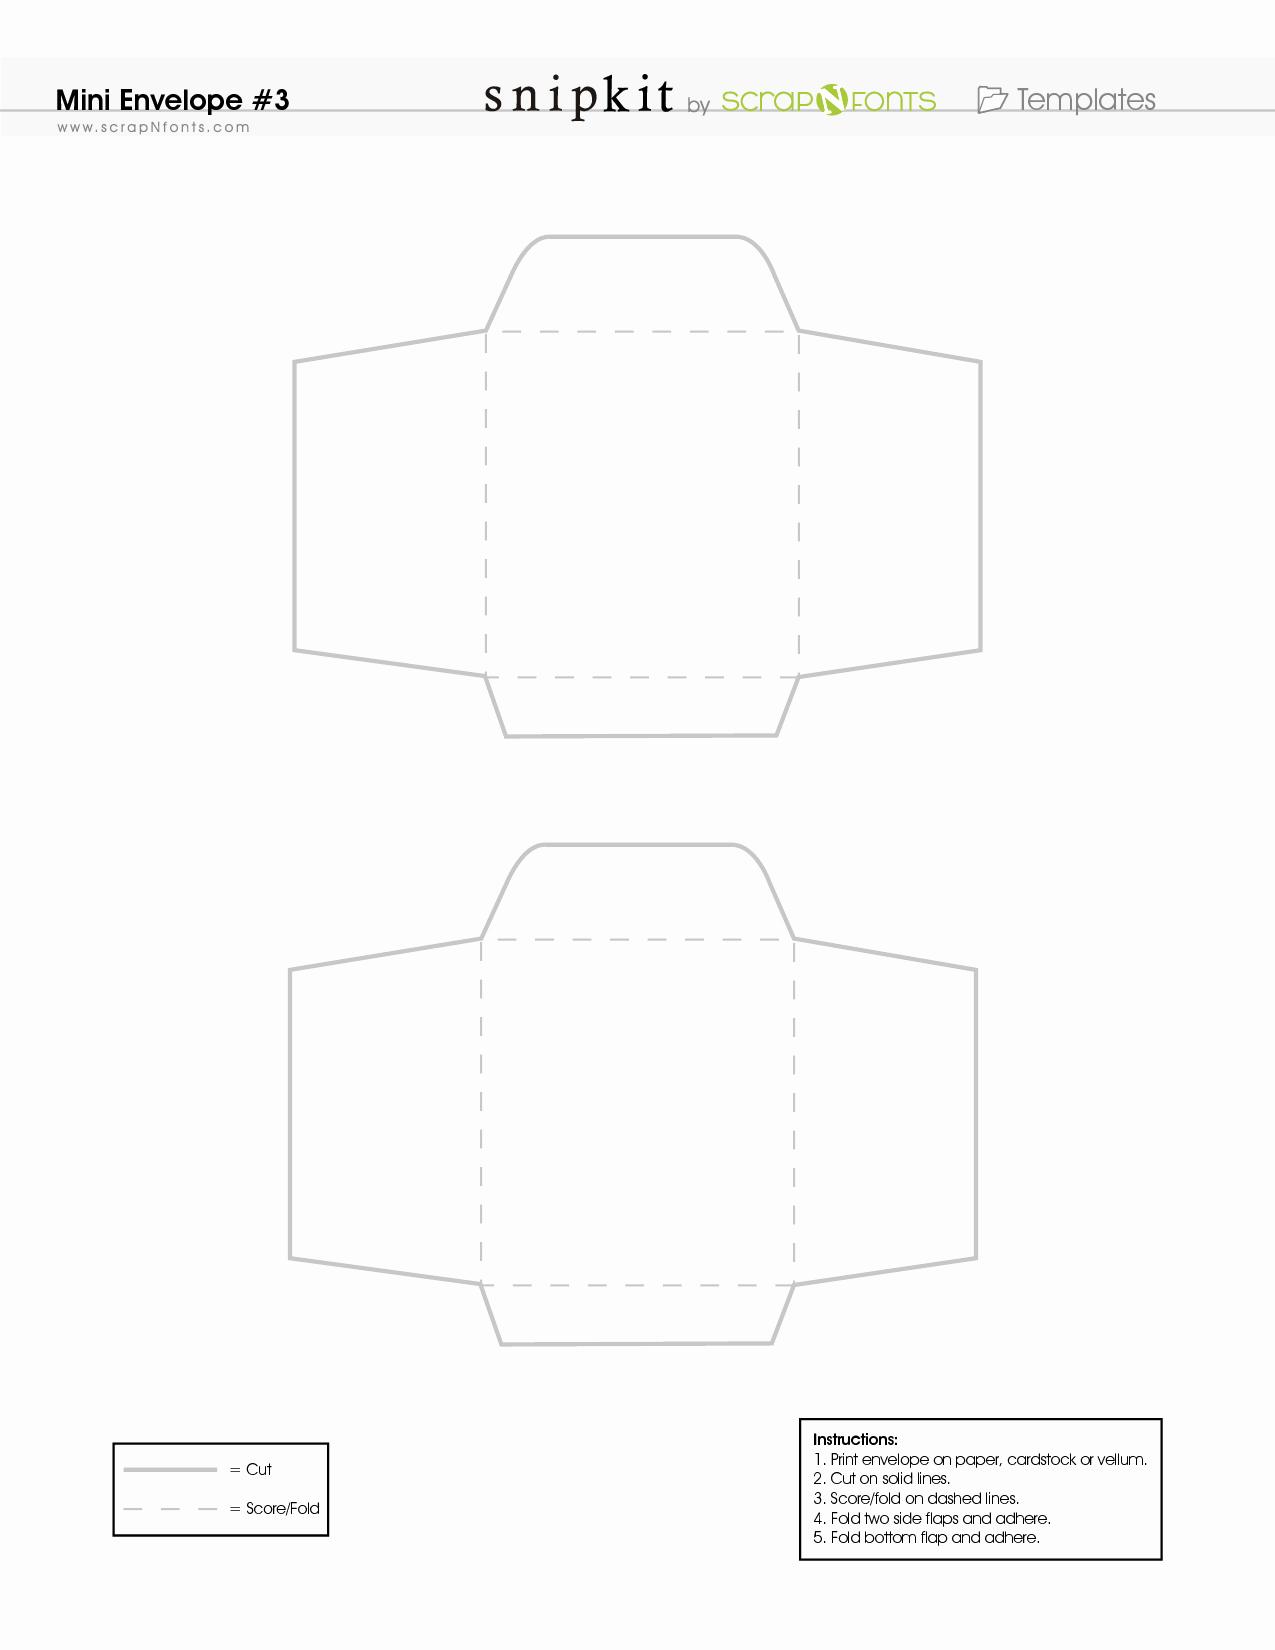 Free Printable Envelope Templates Lovely Free Printable Mini Envelope Template Pdf